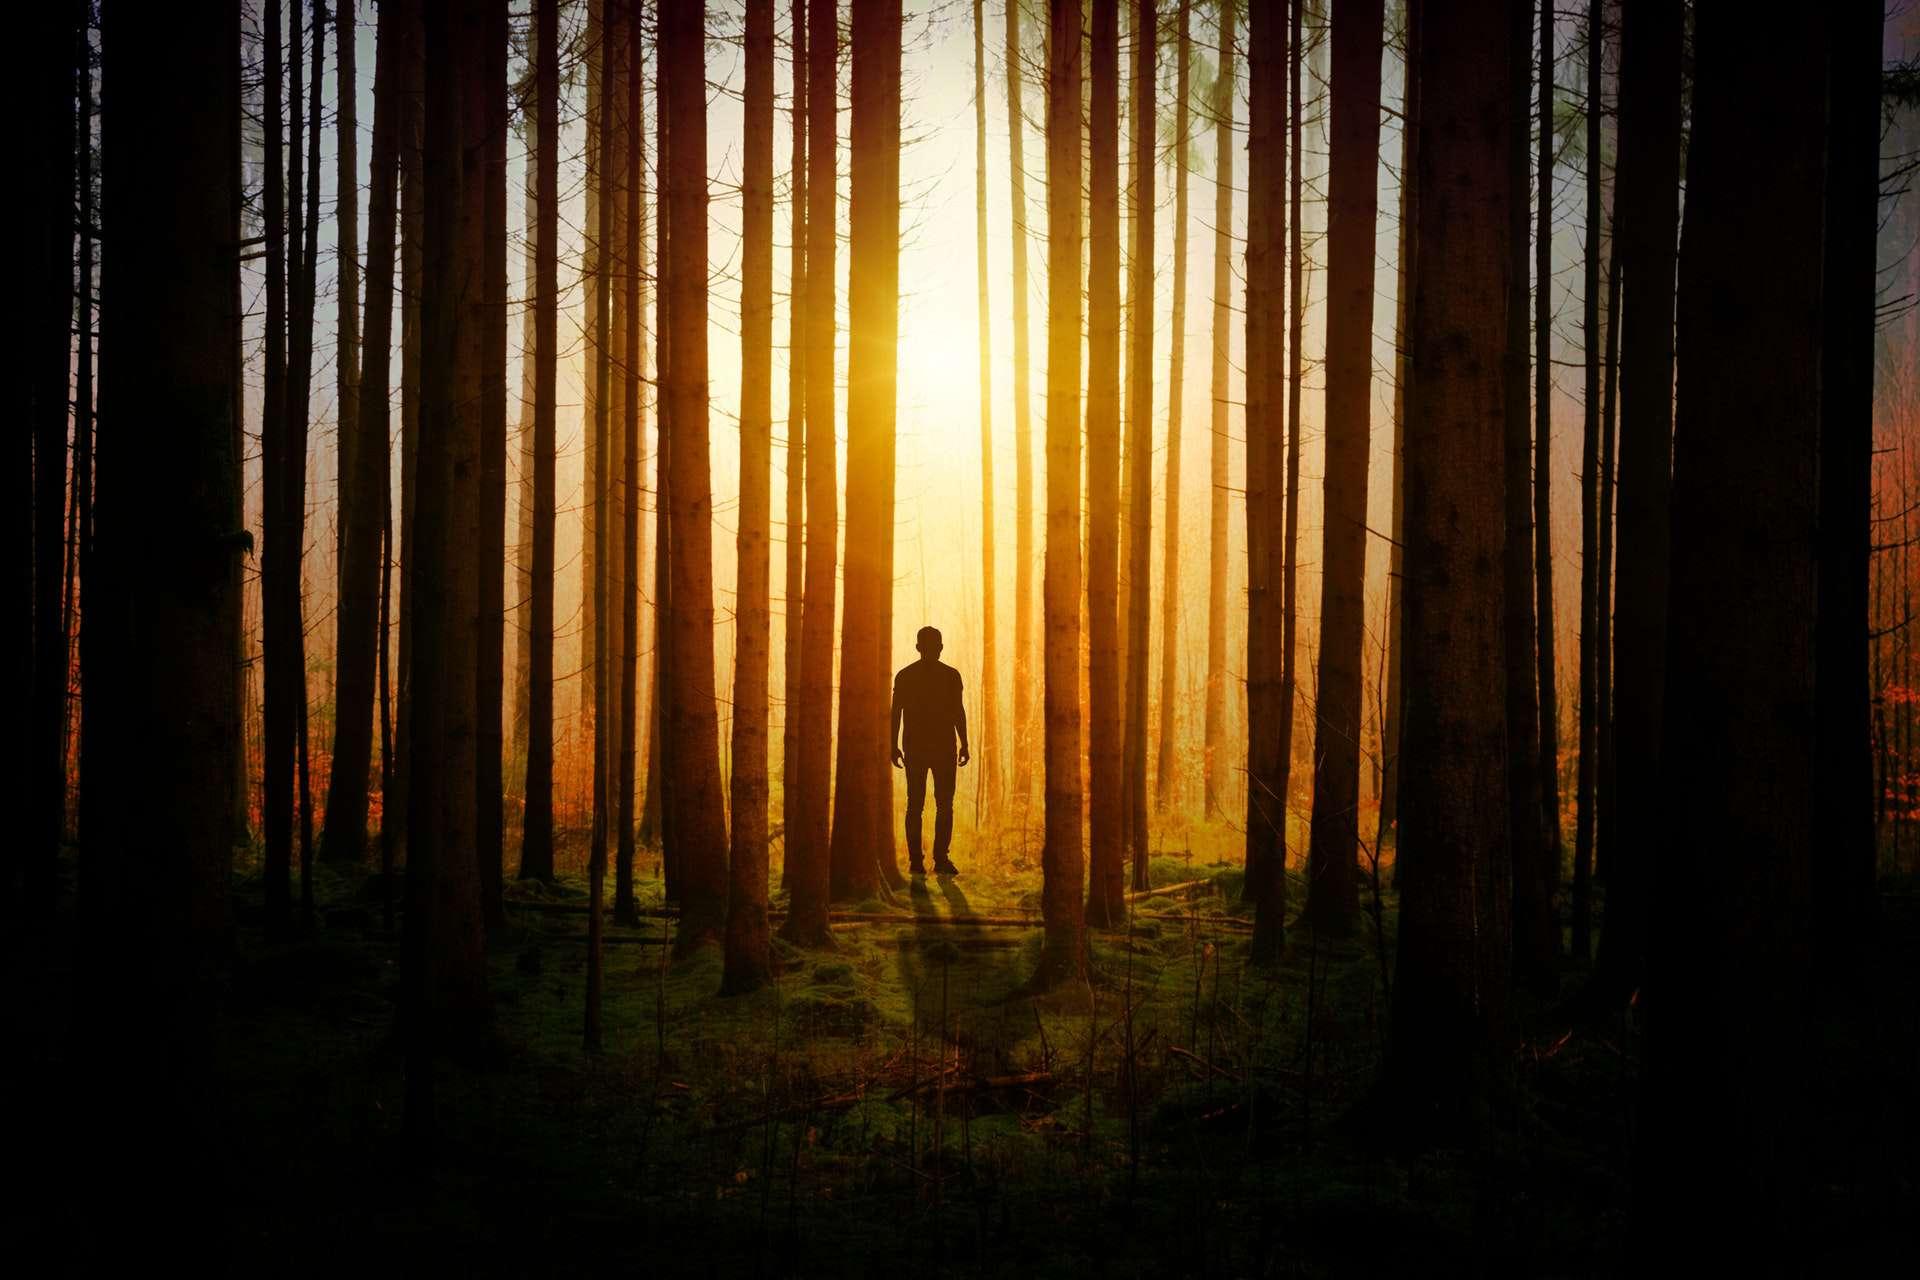 man in woods trees silhouette shadow pexels-photo-1114897